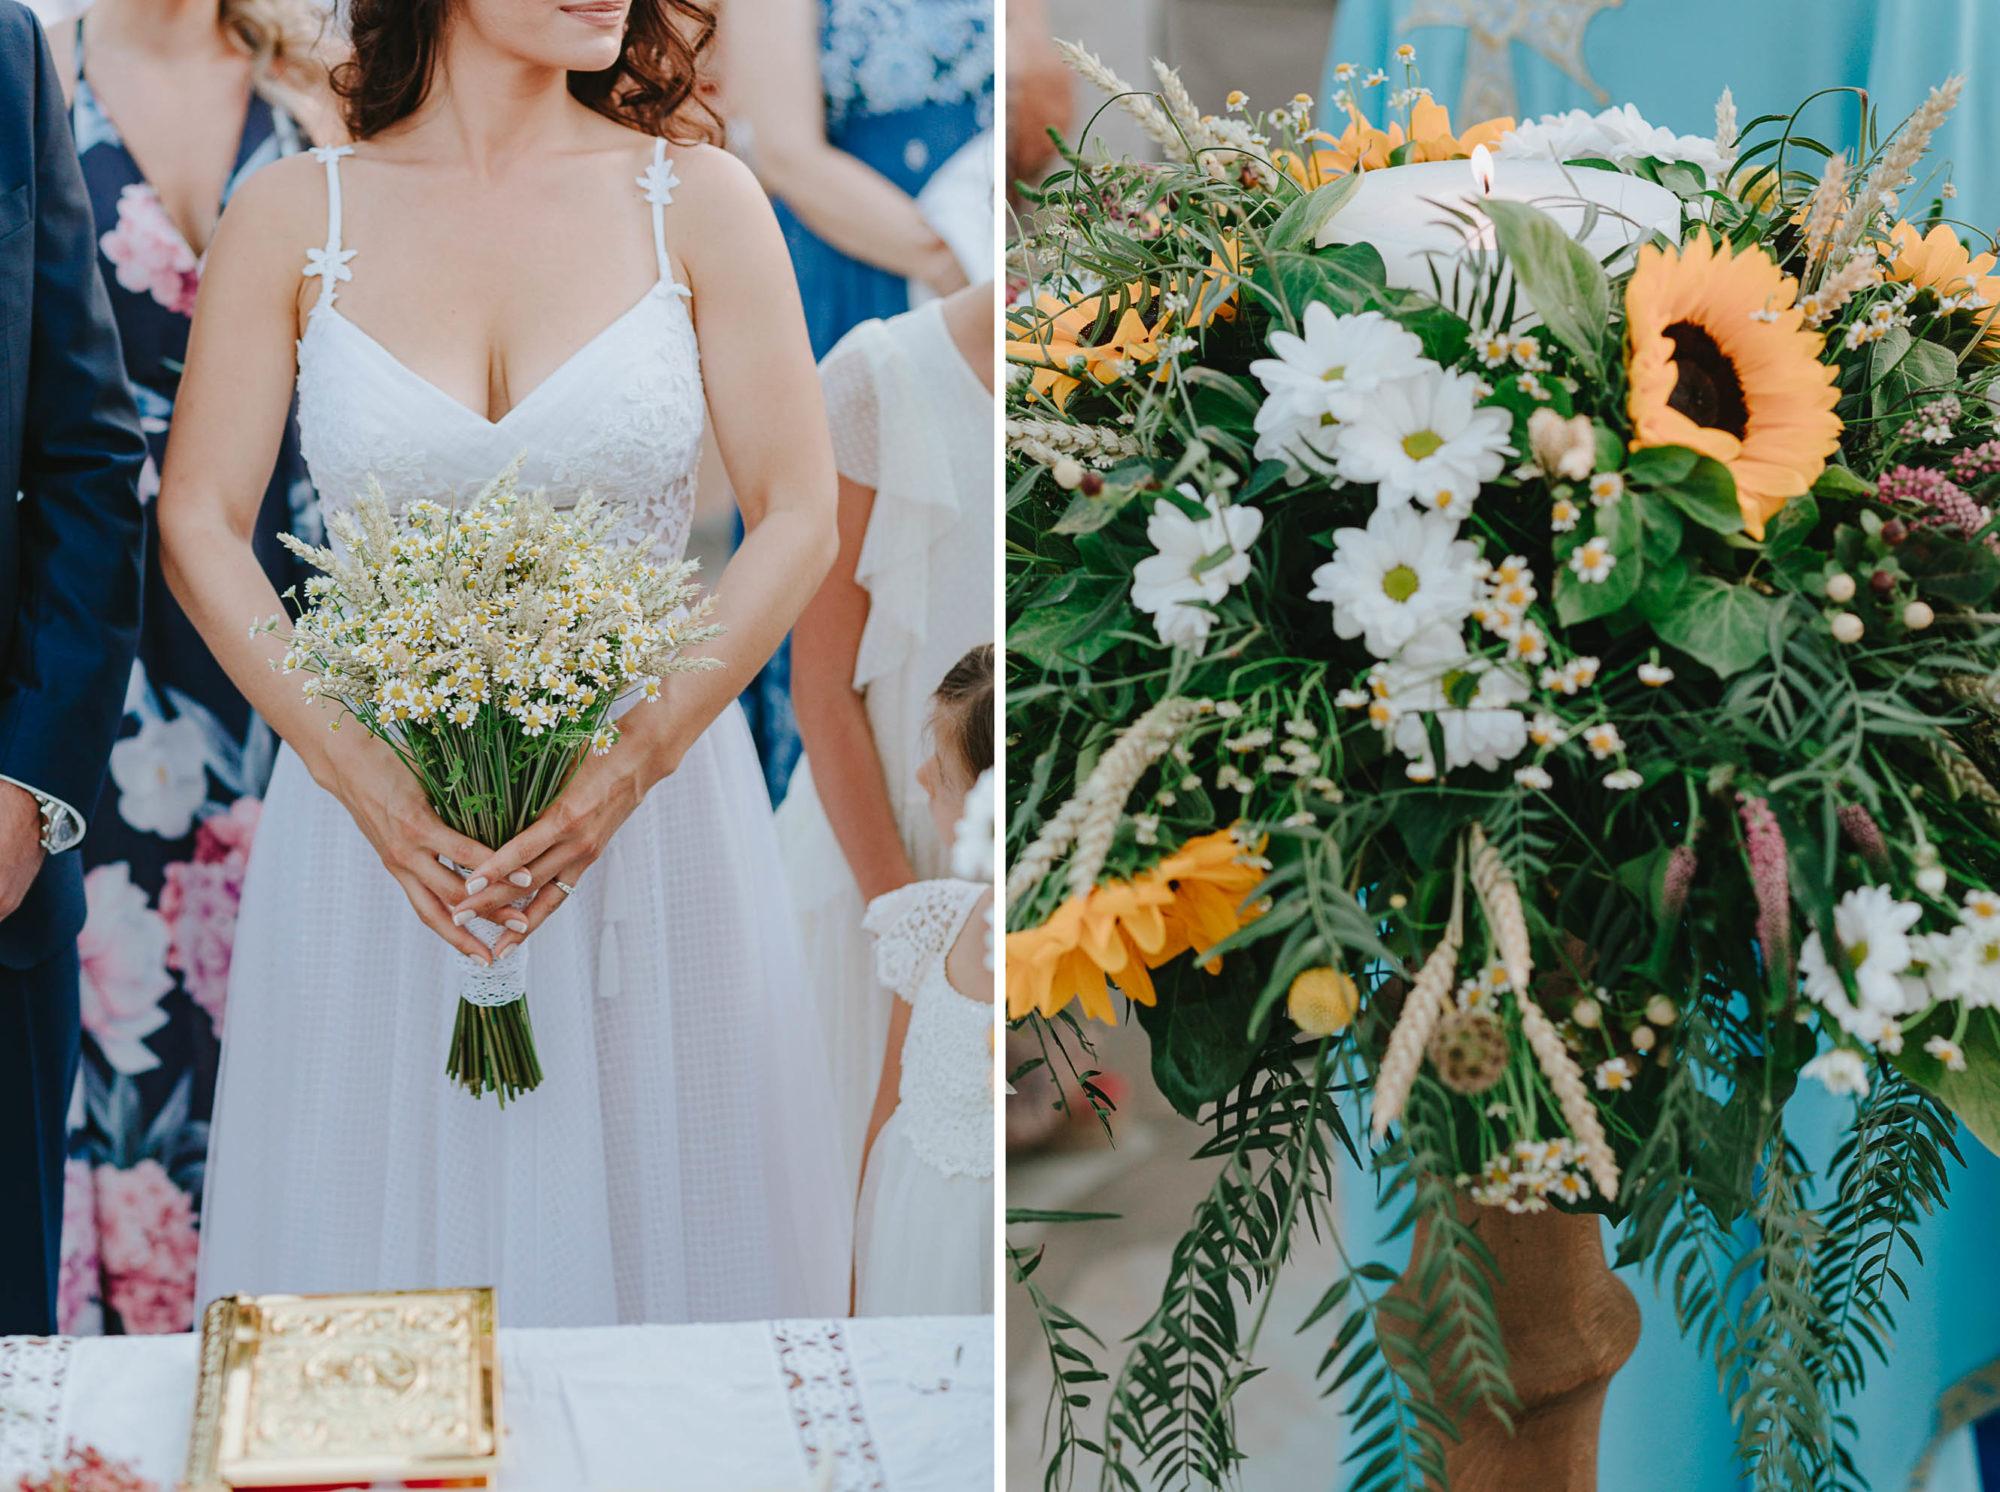 A summer wedding party at Kythnos